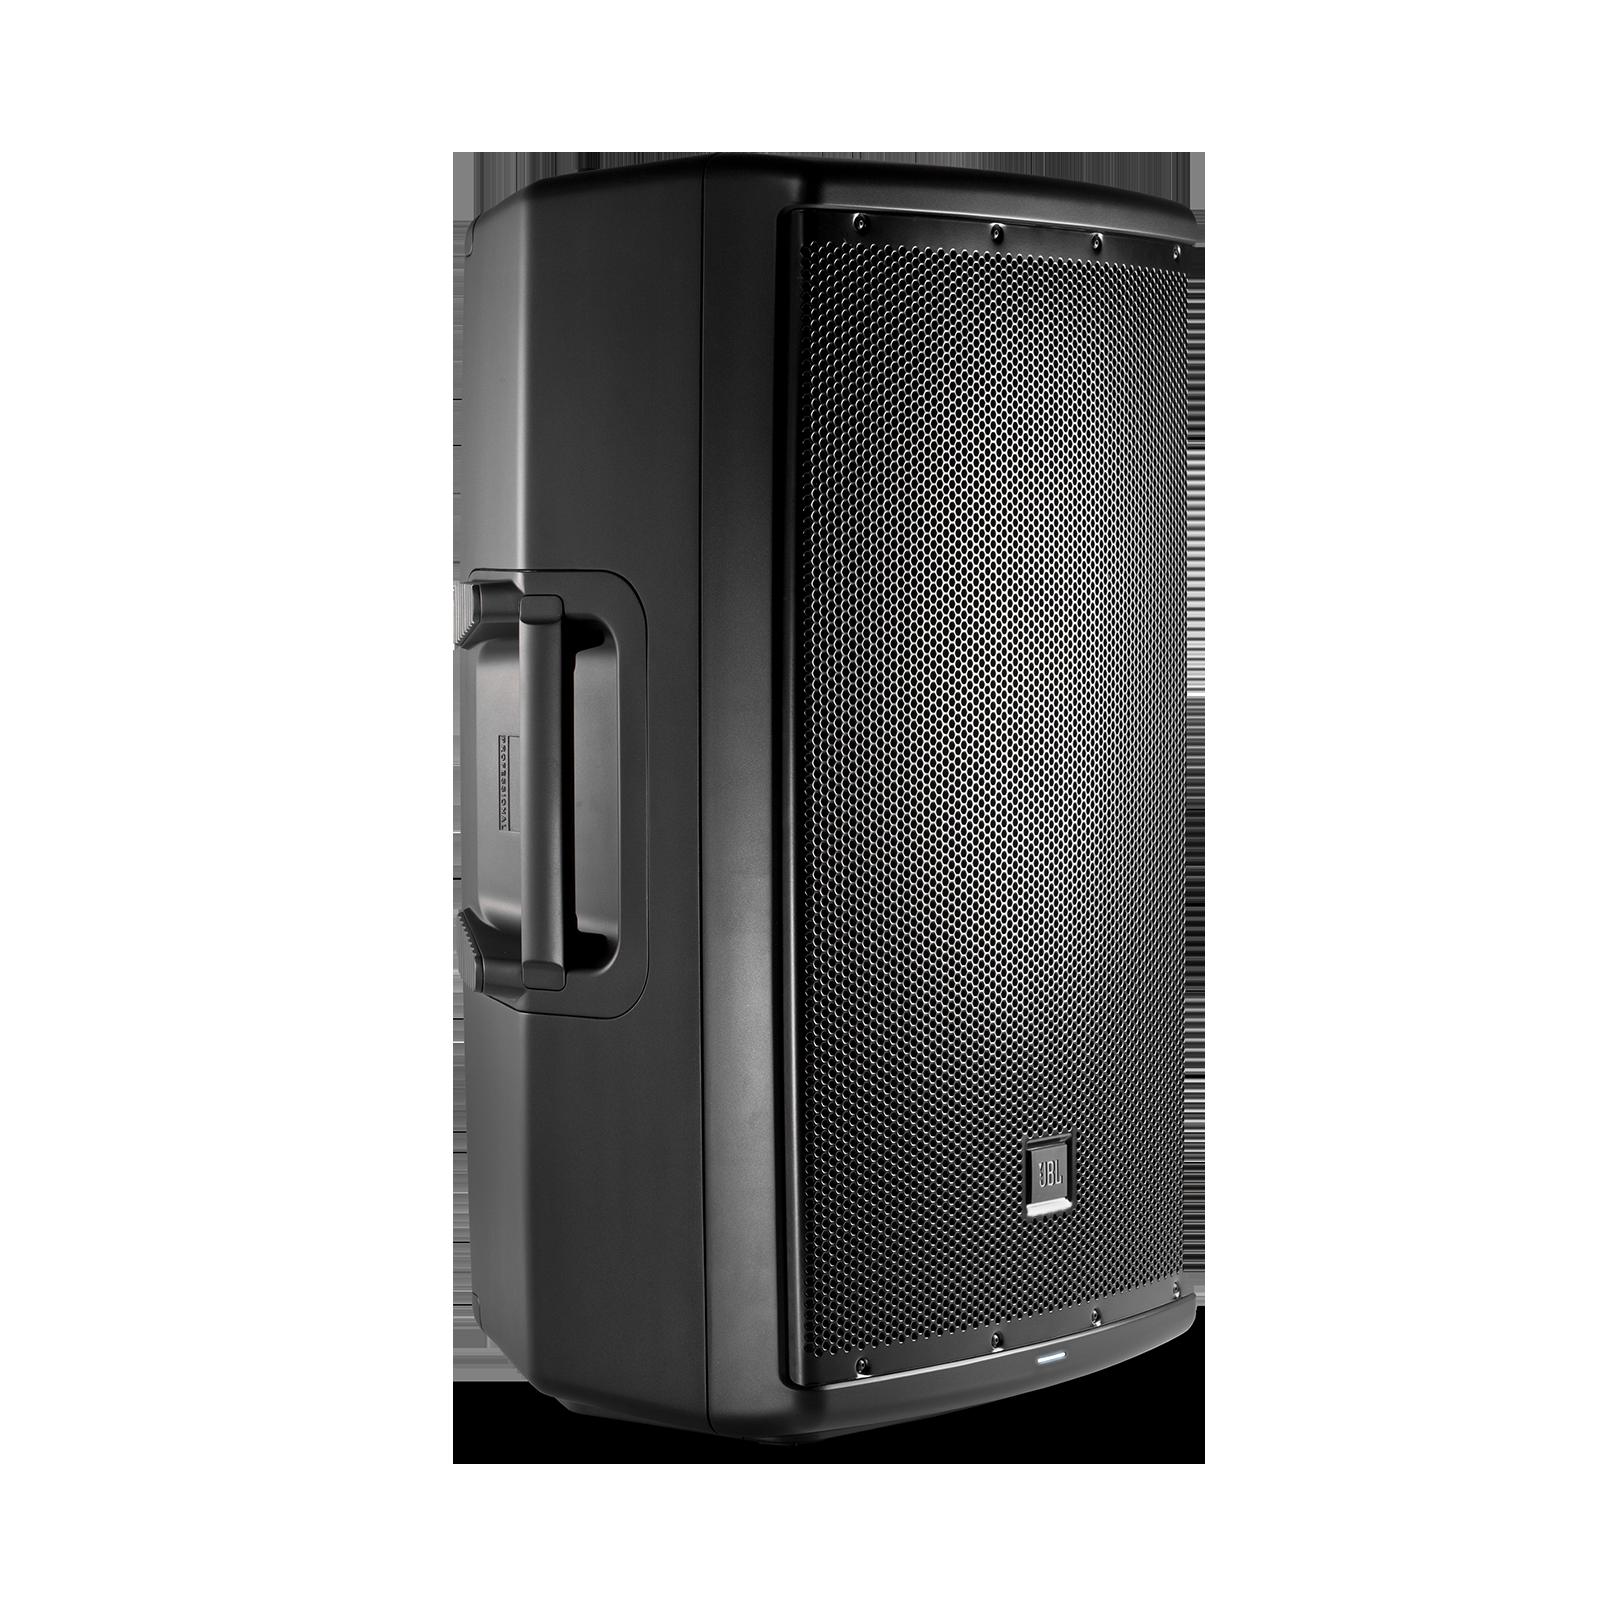 "JBL EON615 - Black - 15"" (38 cm) Two-Way Multipurpose Self-Powered Sound Reinforcement - Detailshot 1"